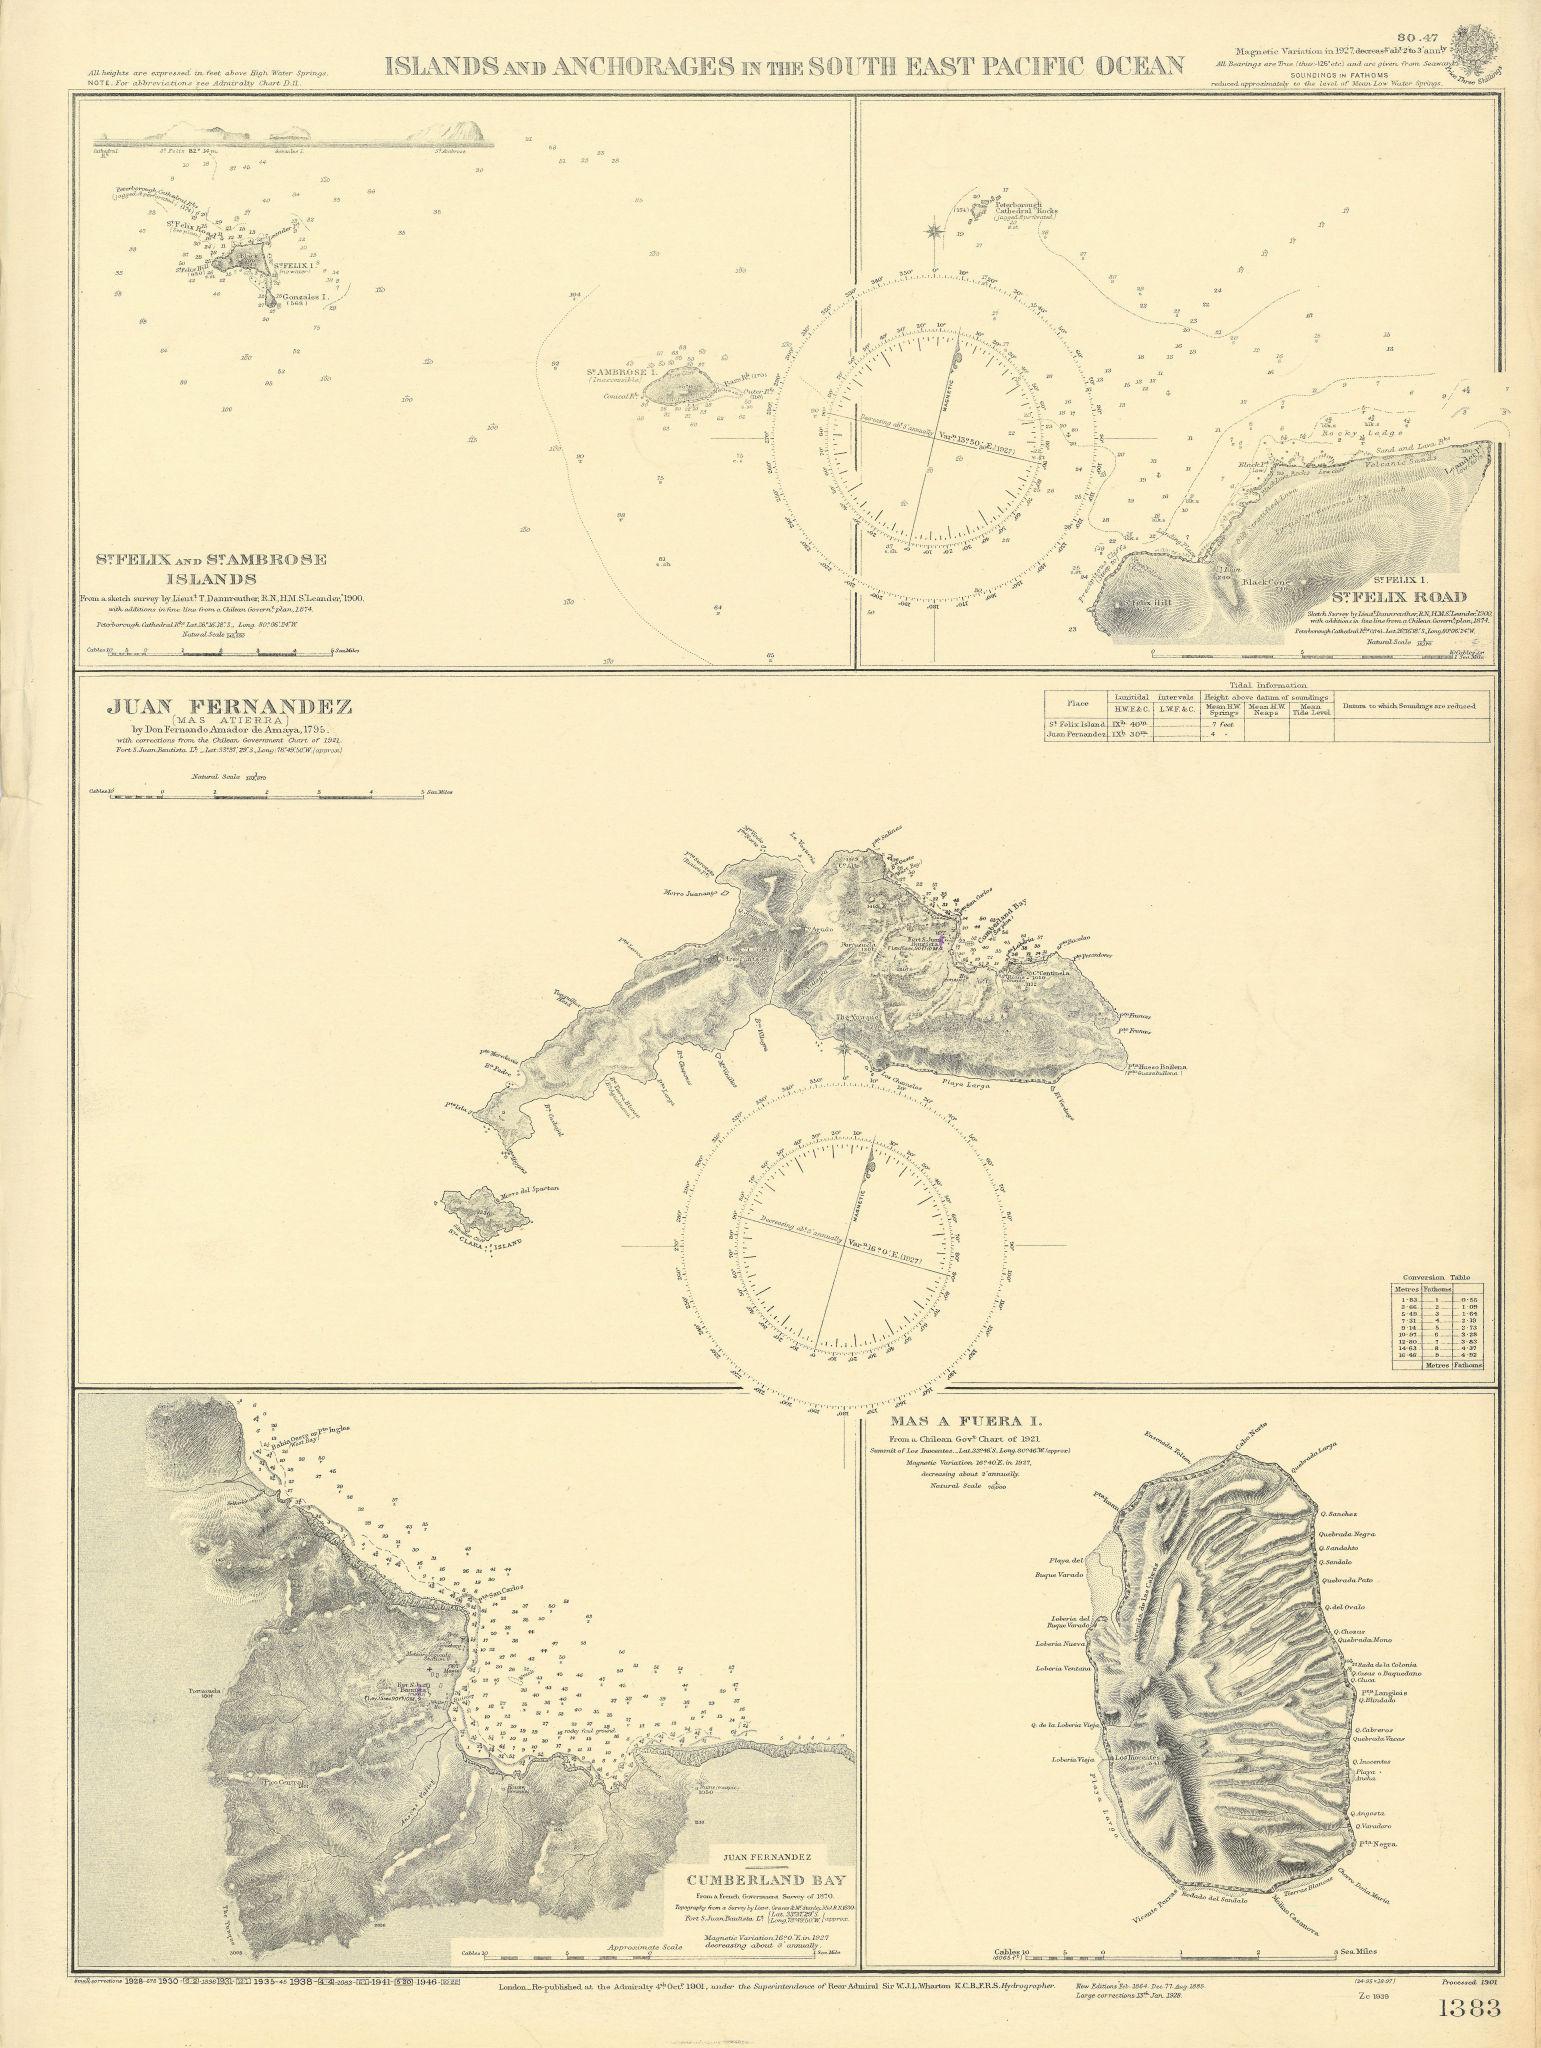 Islas Juan Fernandez Desventuradas Chile Pacific ADMIRALTY chart 1901 (1946) map